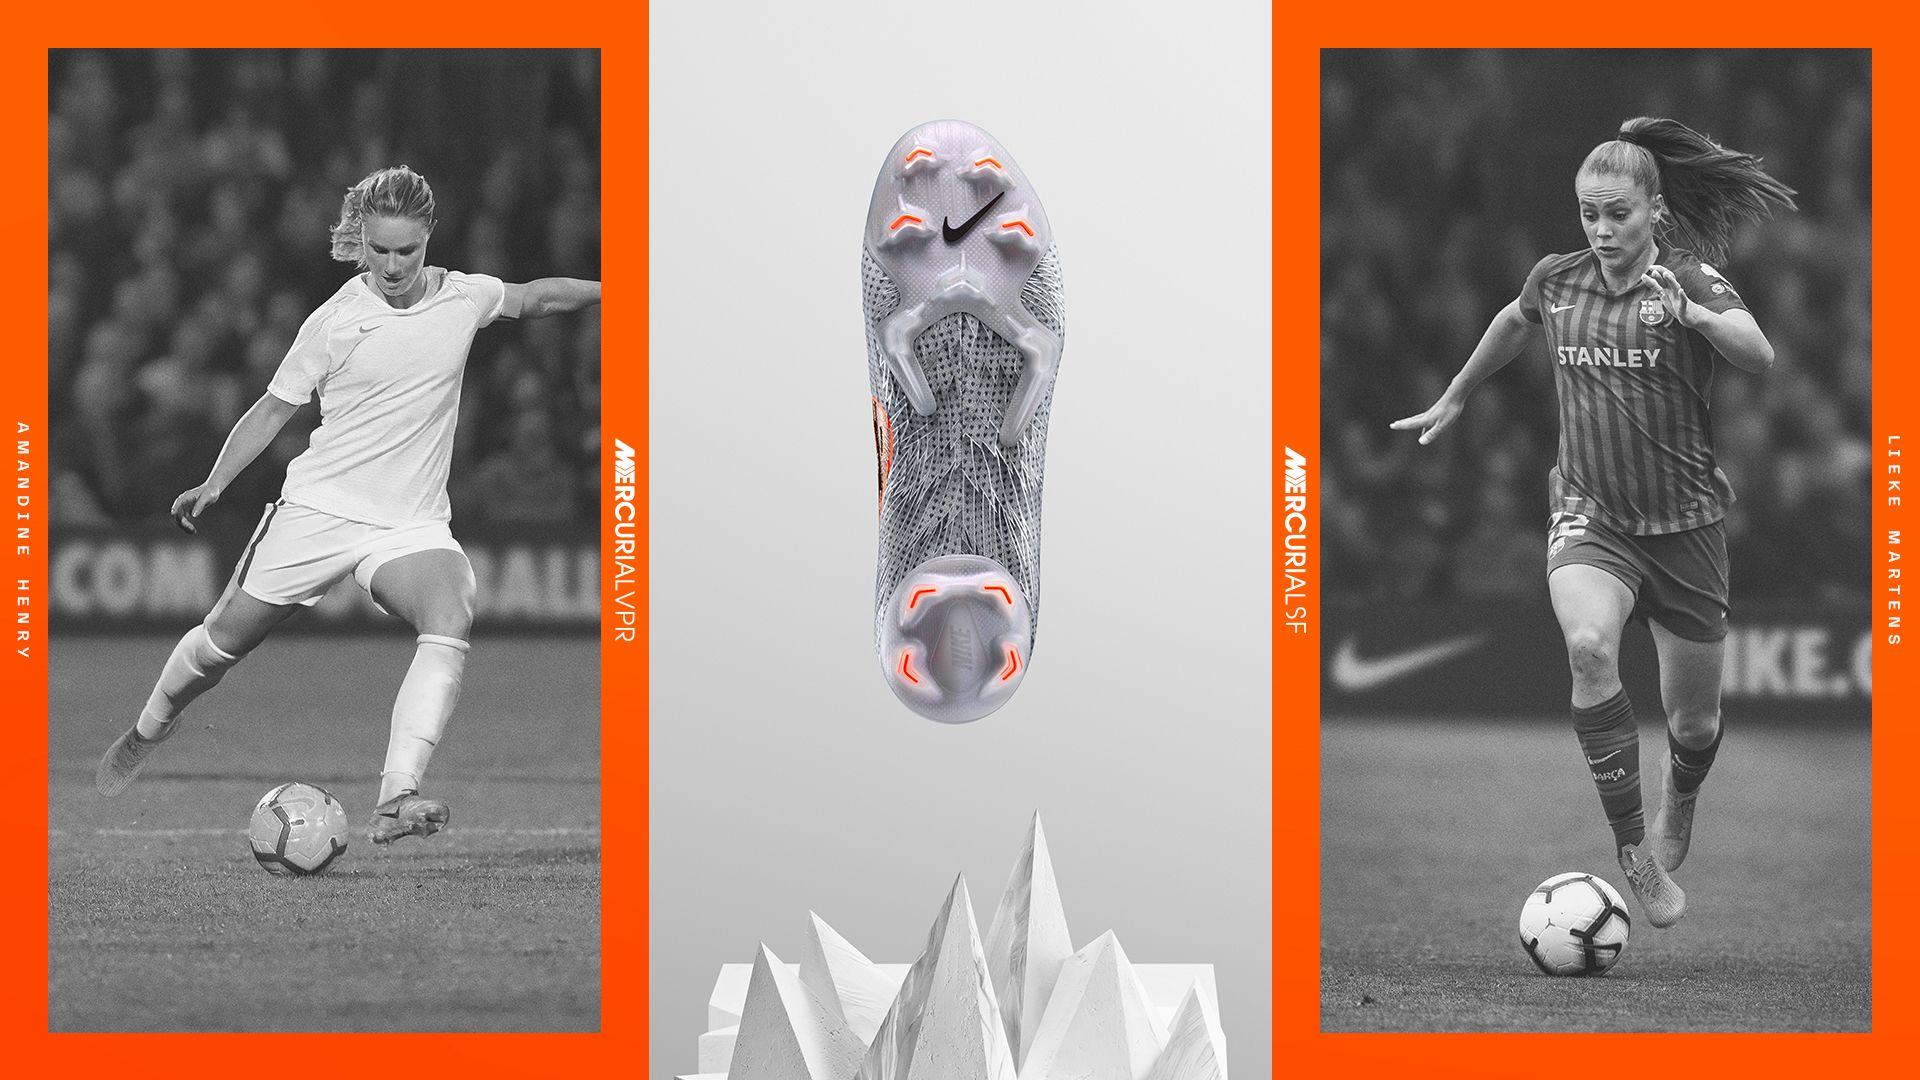 371f0d7f14 Επόμενος στόχος  Η κορυφή της Ευρώπης!. Nike.com GR